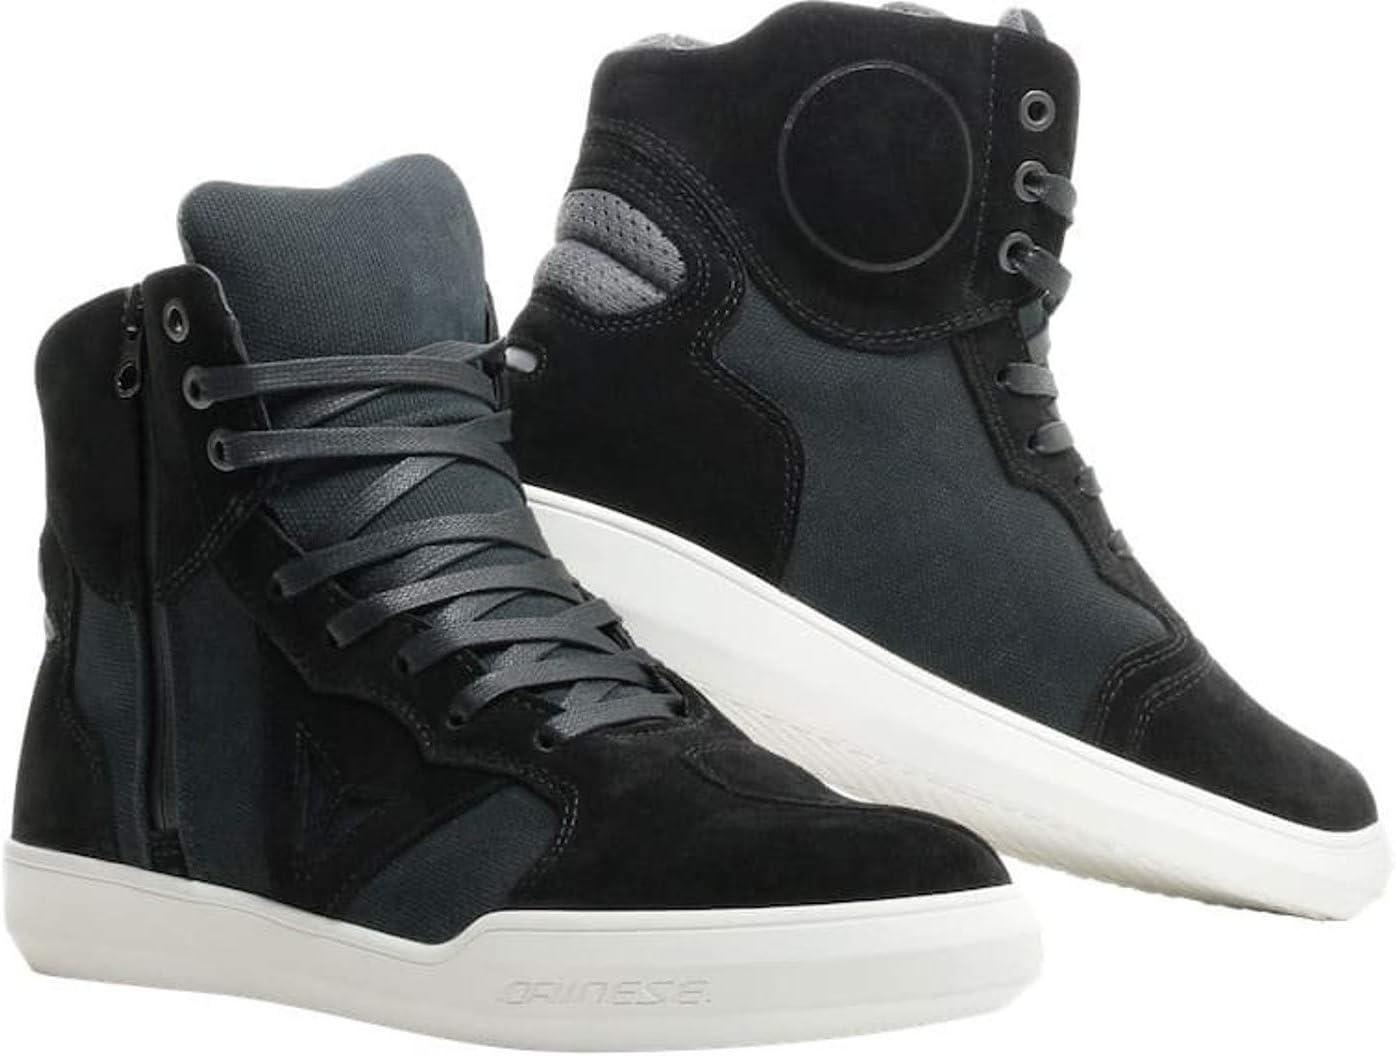 45, black//anthracite Metropolis Shoes